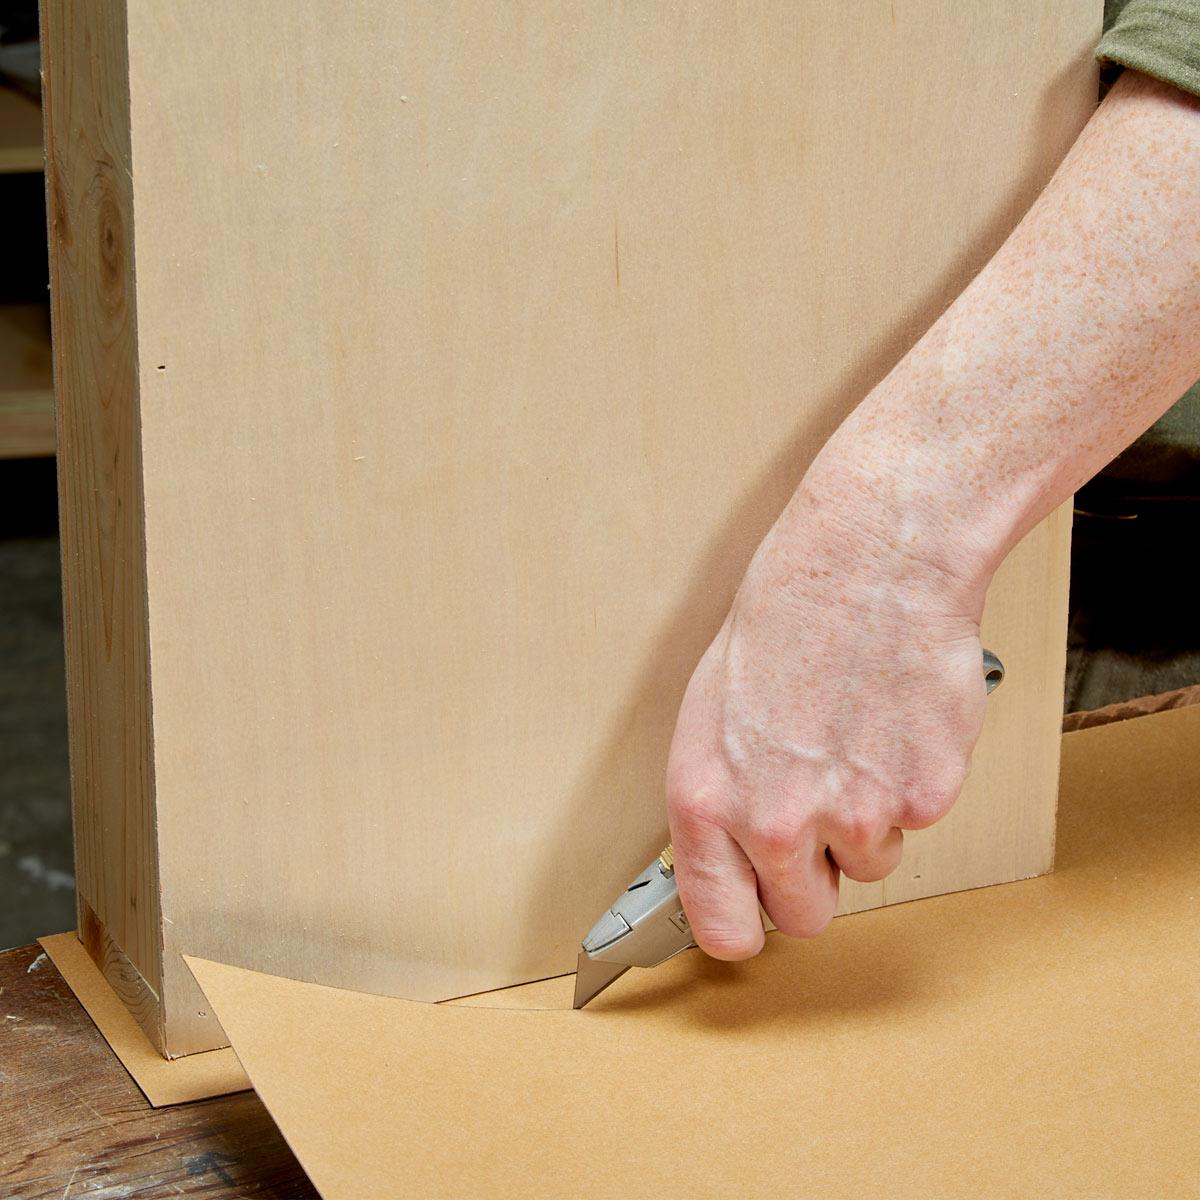 how build floating shelf with secret drawer family handyman floatingshelf compartment plans rough cut oak kitchen cart ikea metal shoe rack shelves over desk hidden hinges screws